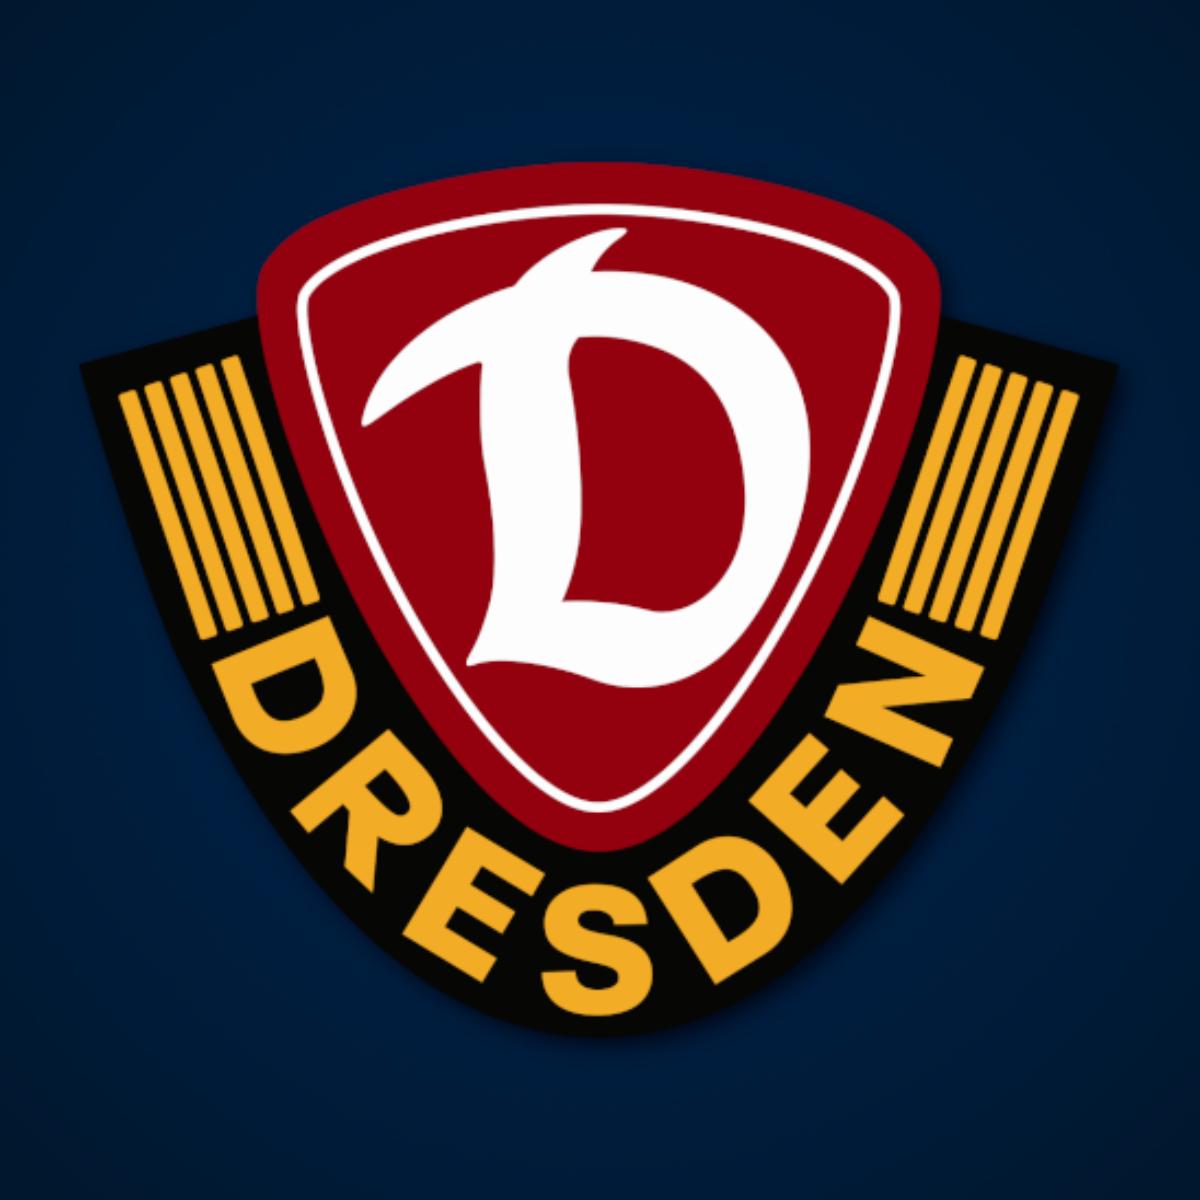 Saisonvorschau Dynamo Dresden: Wohin führt der Weg?